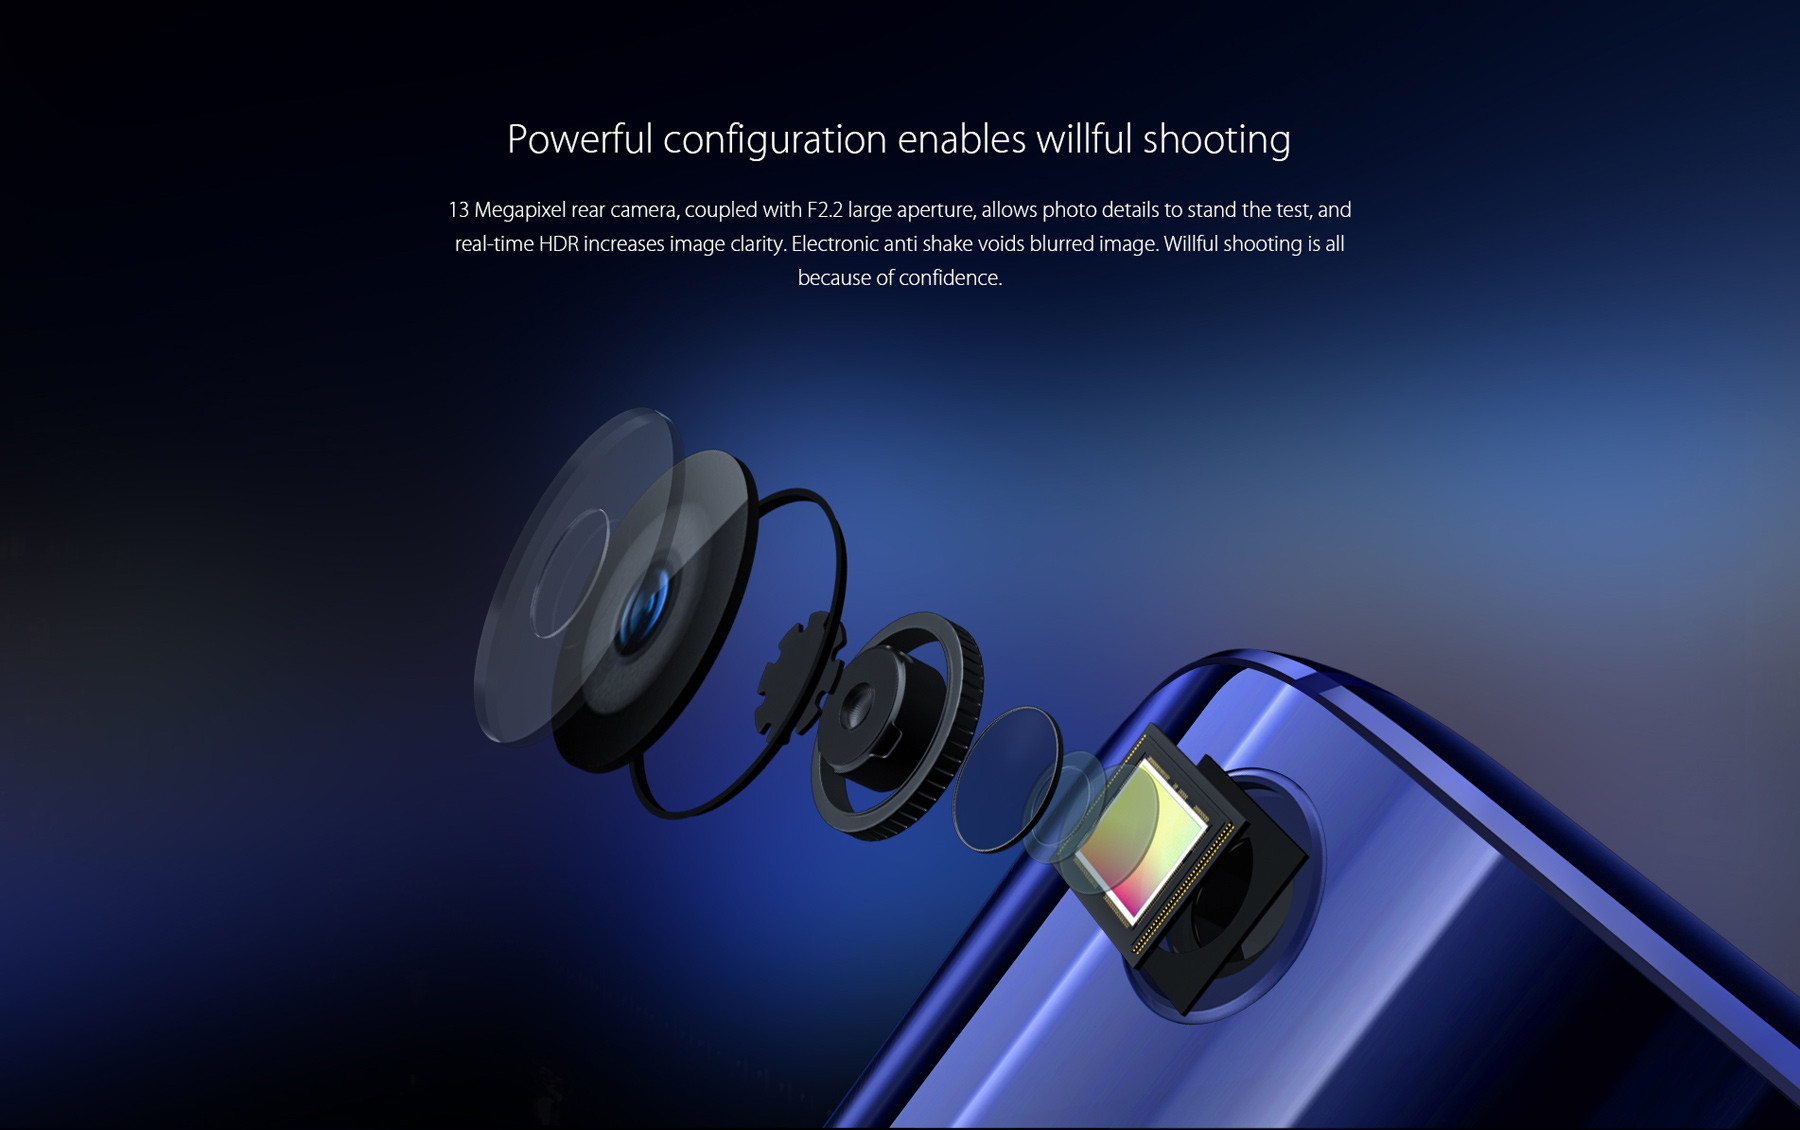 elphone s7 カメラ性能